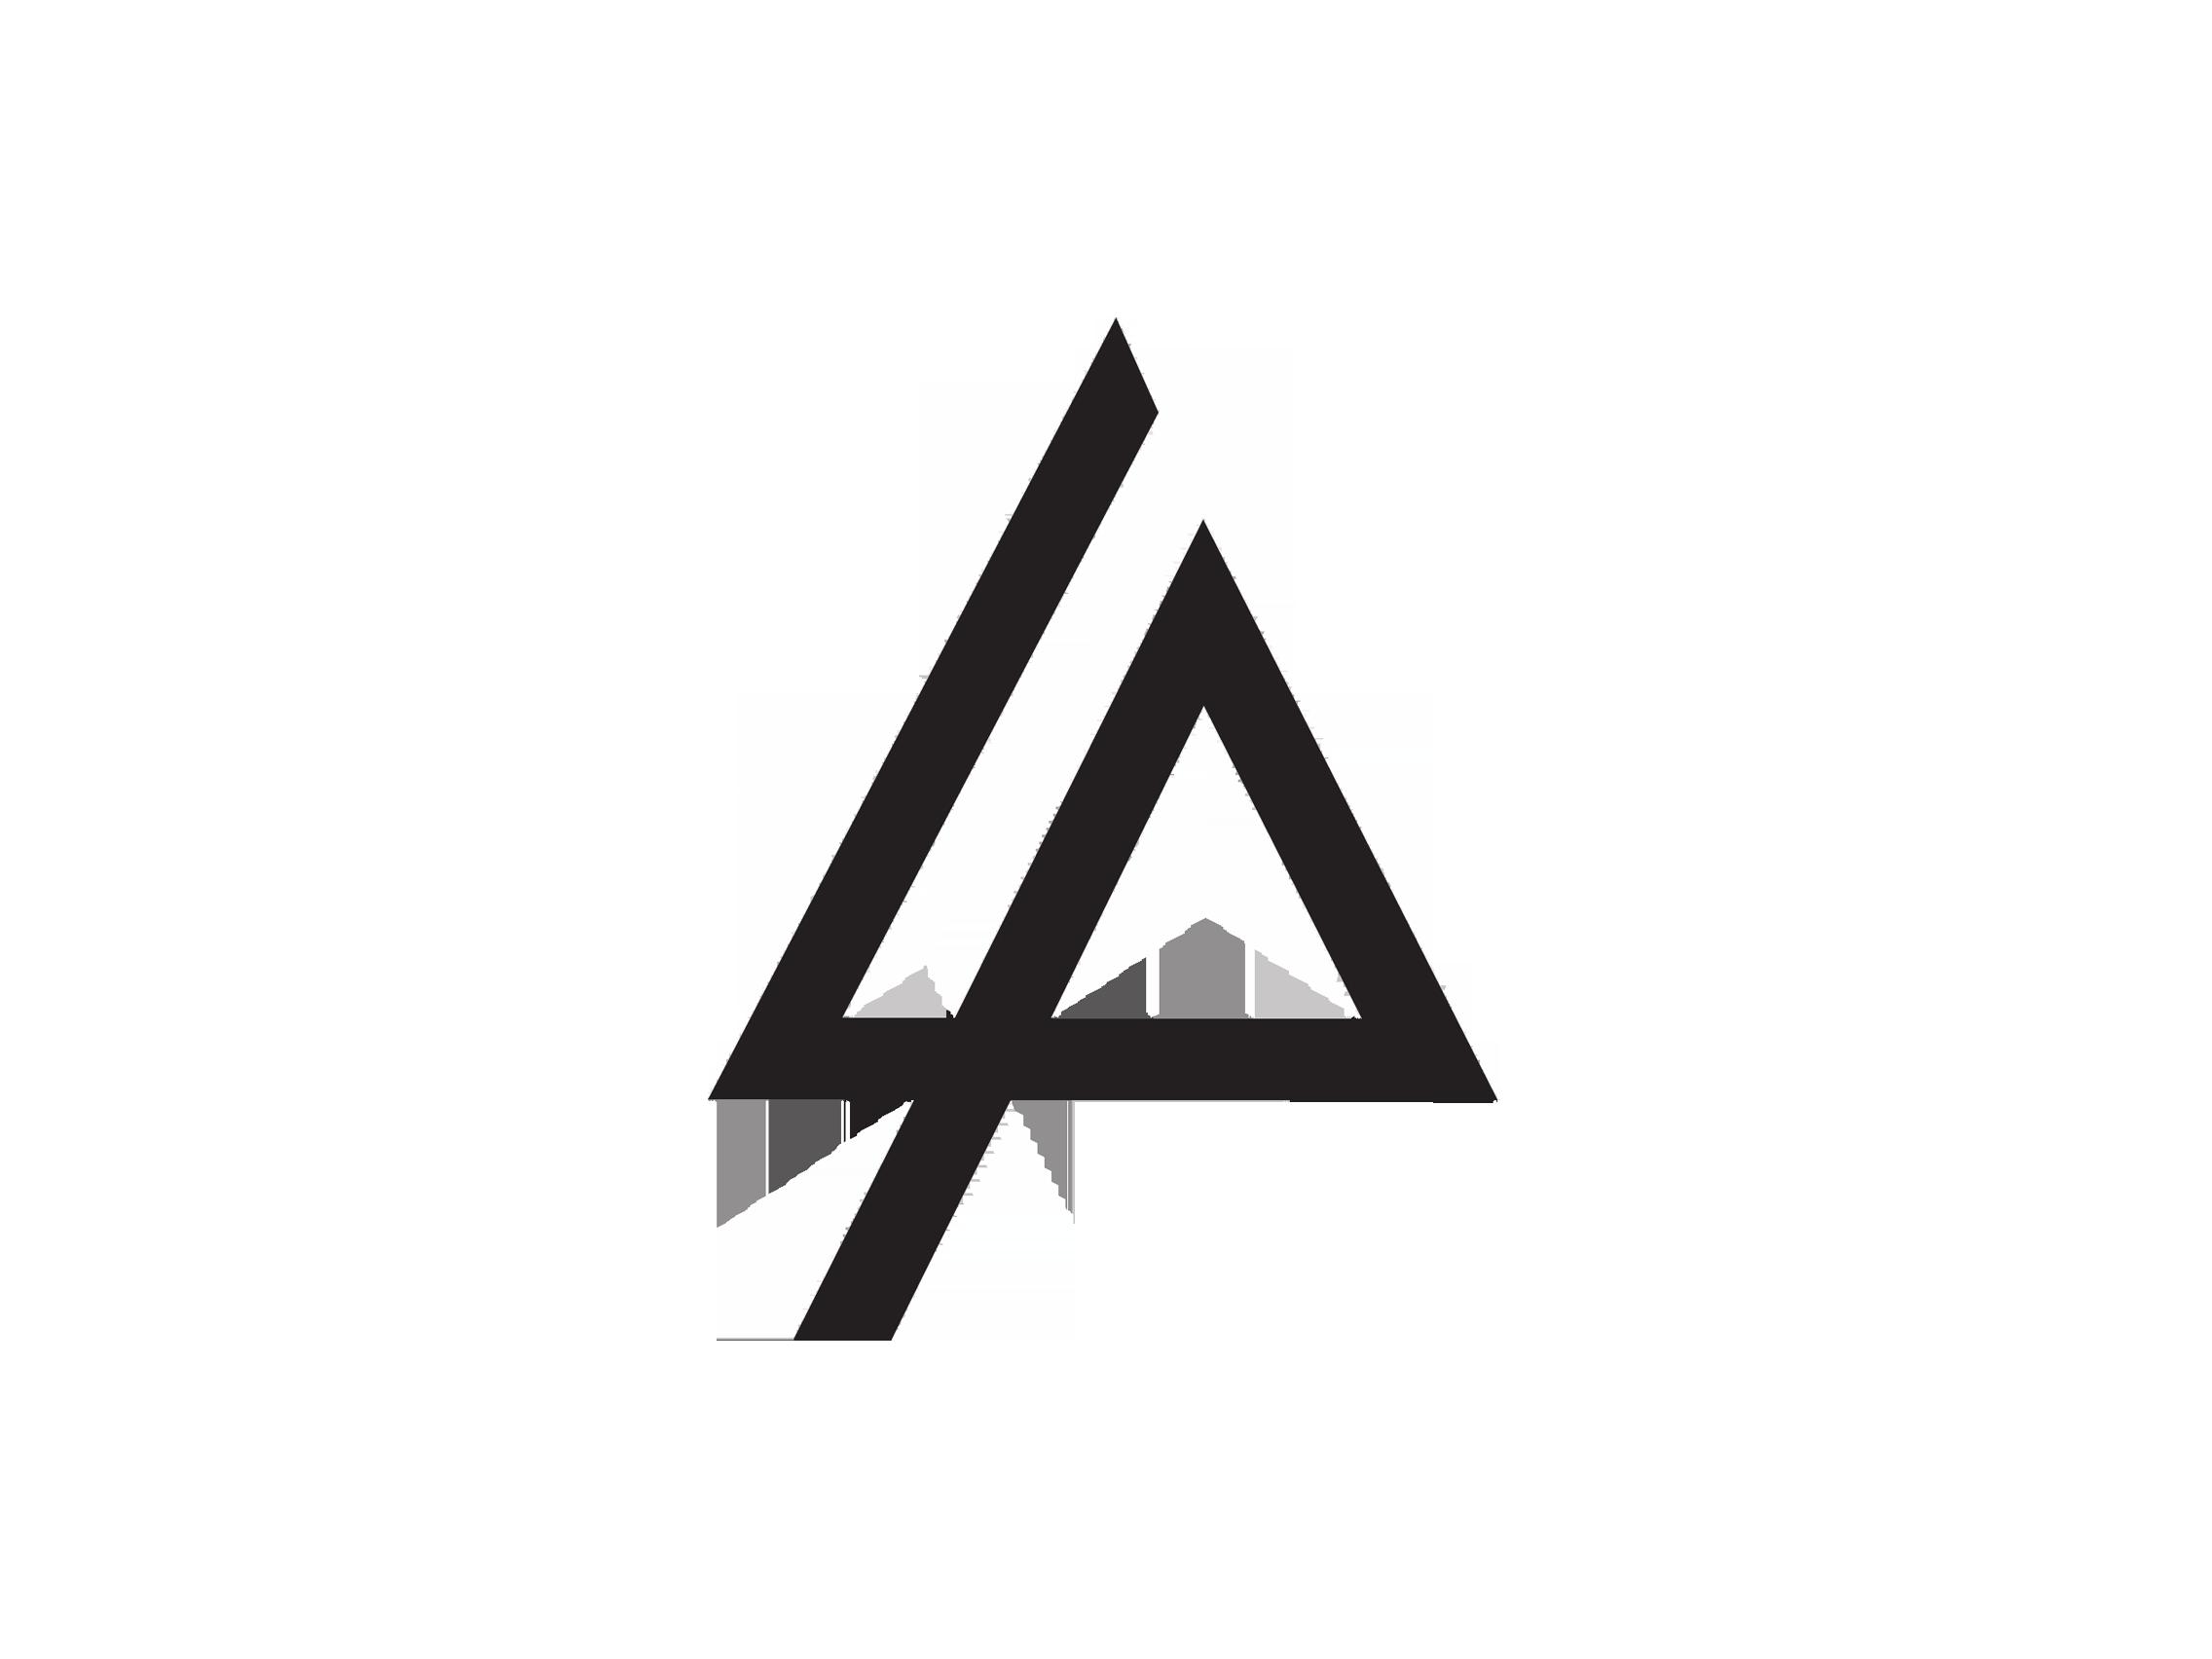 Triangle Logo Google Other Diys Pinte